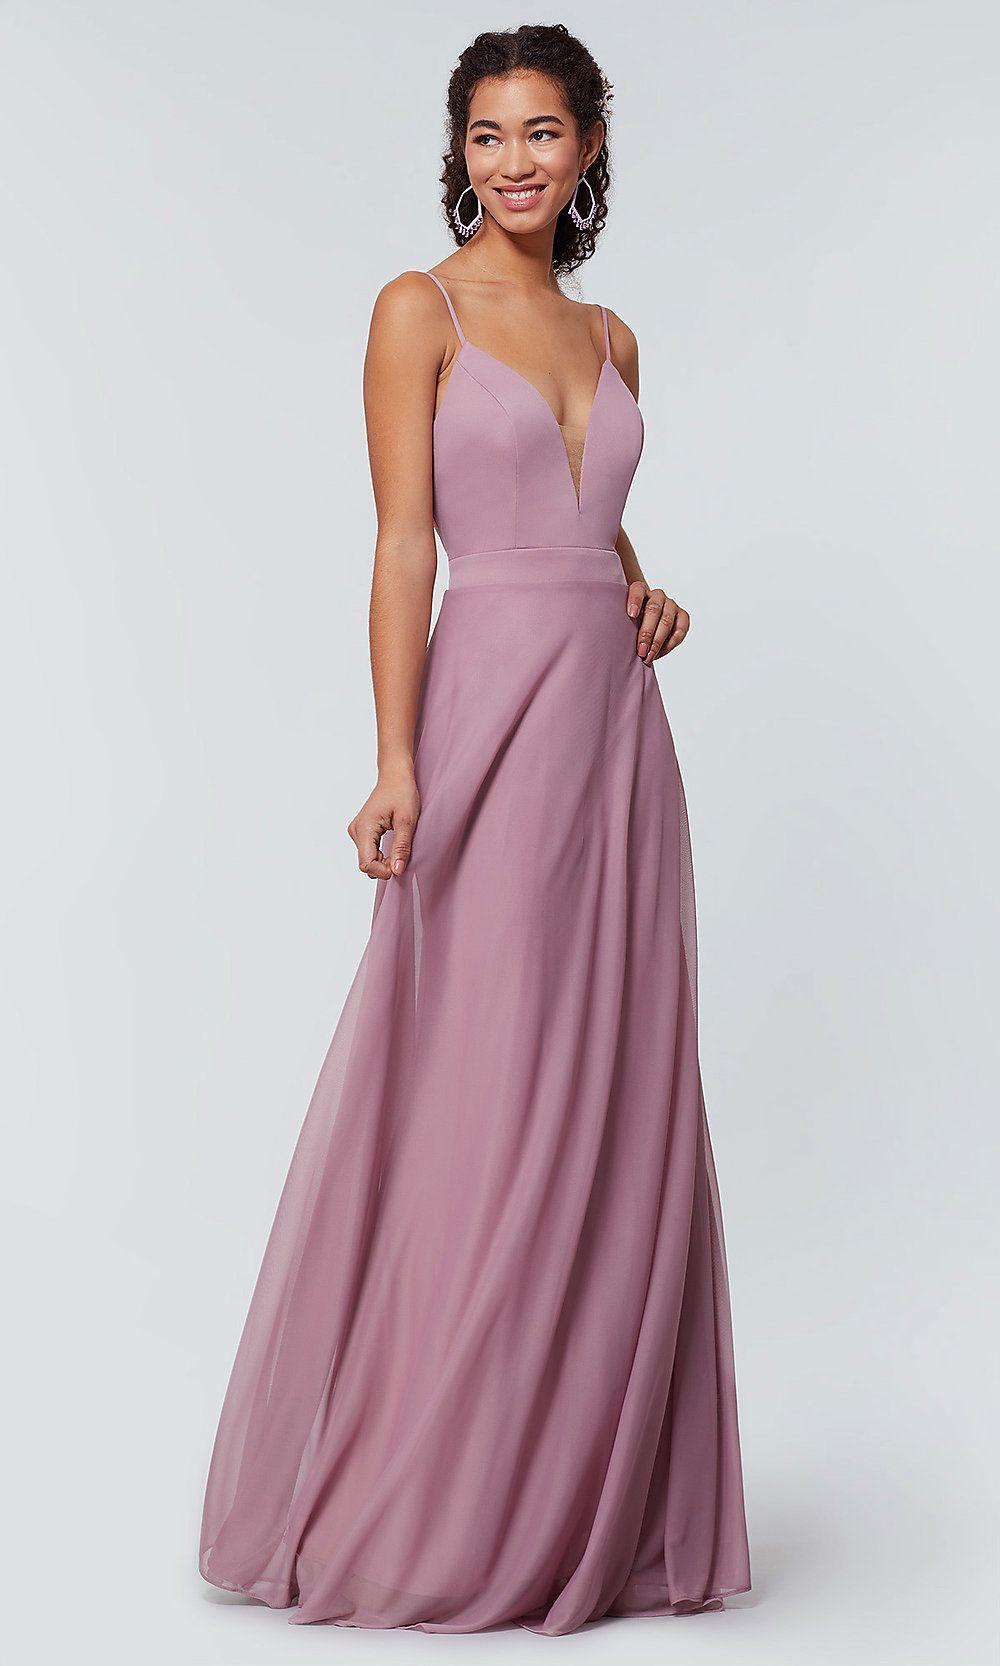 2bbd6dc3d8d Kleinfeld Long Bridesmaid Dress with Deep V-Neckline